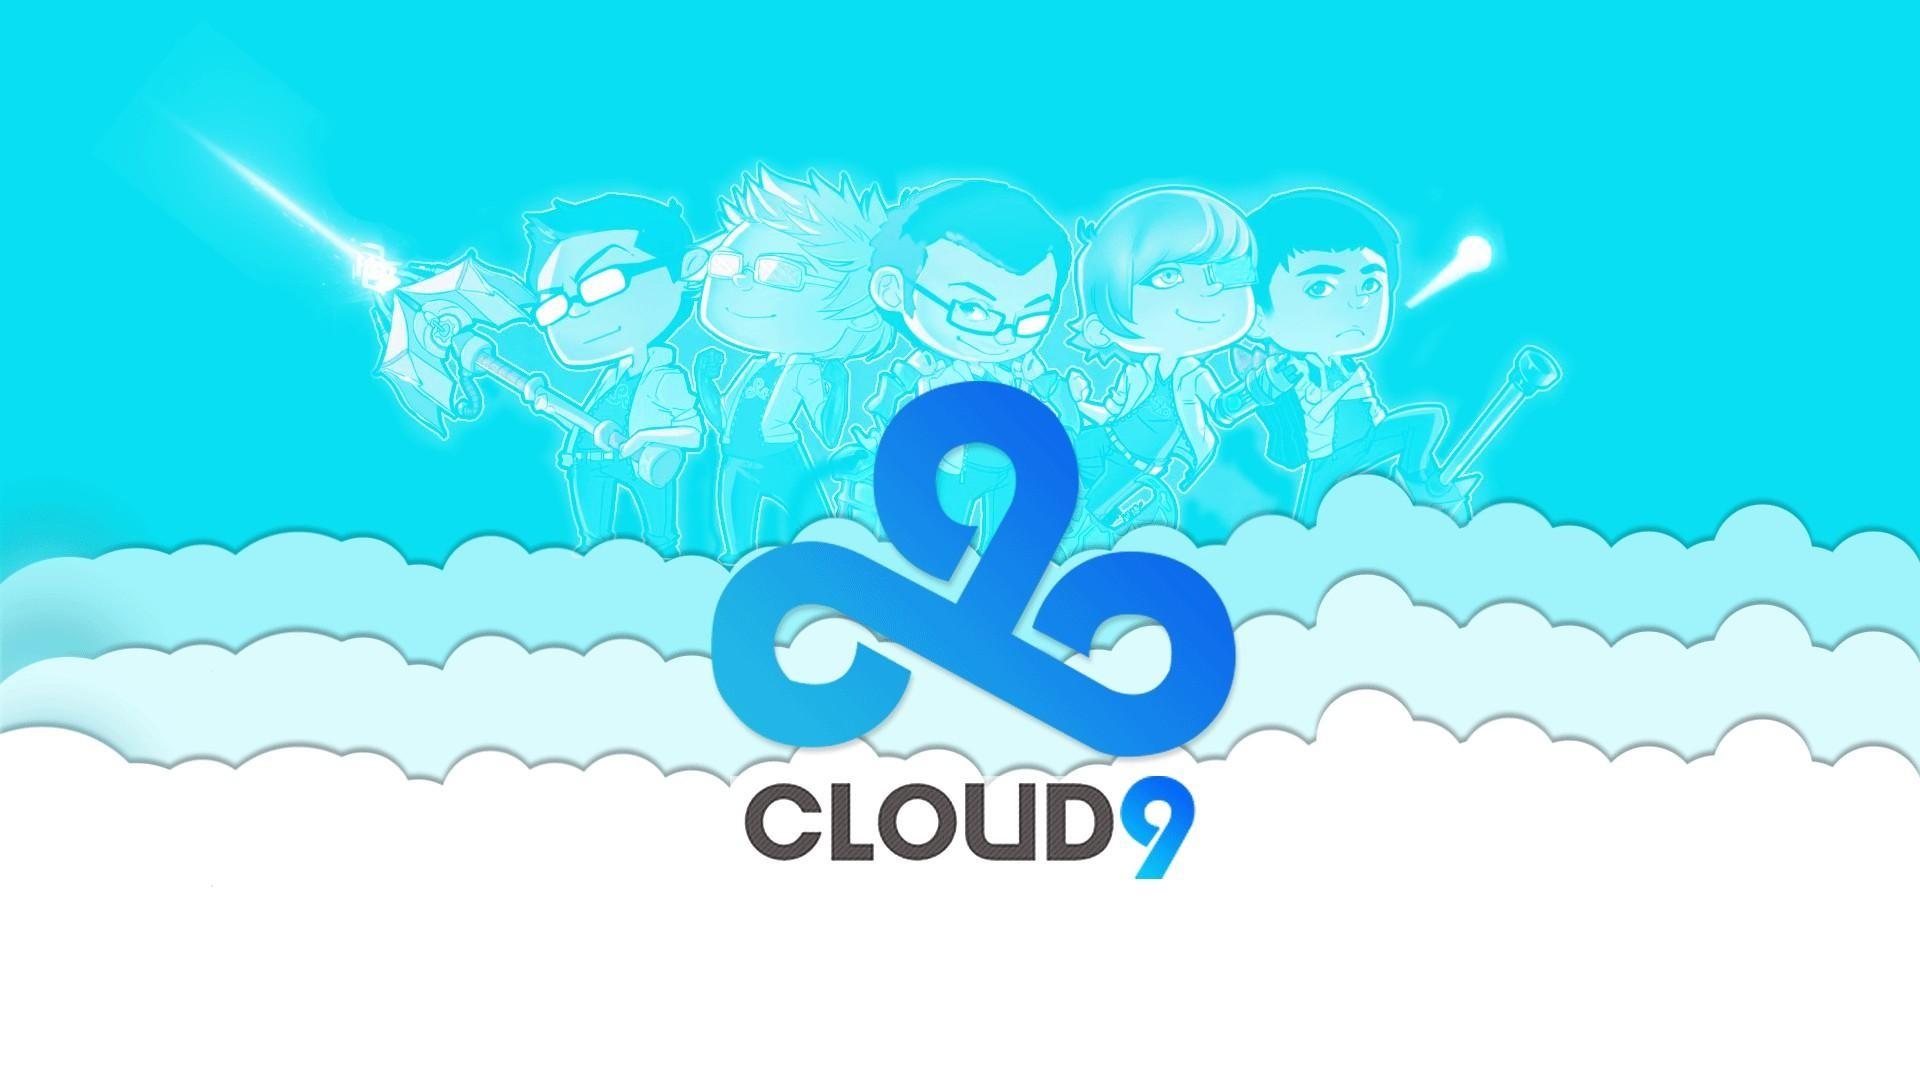 Cloud 9 lcs league of legends championship meteos wallpaper | (62161)